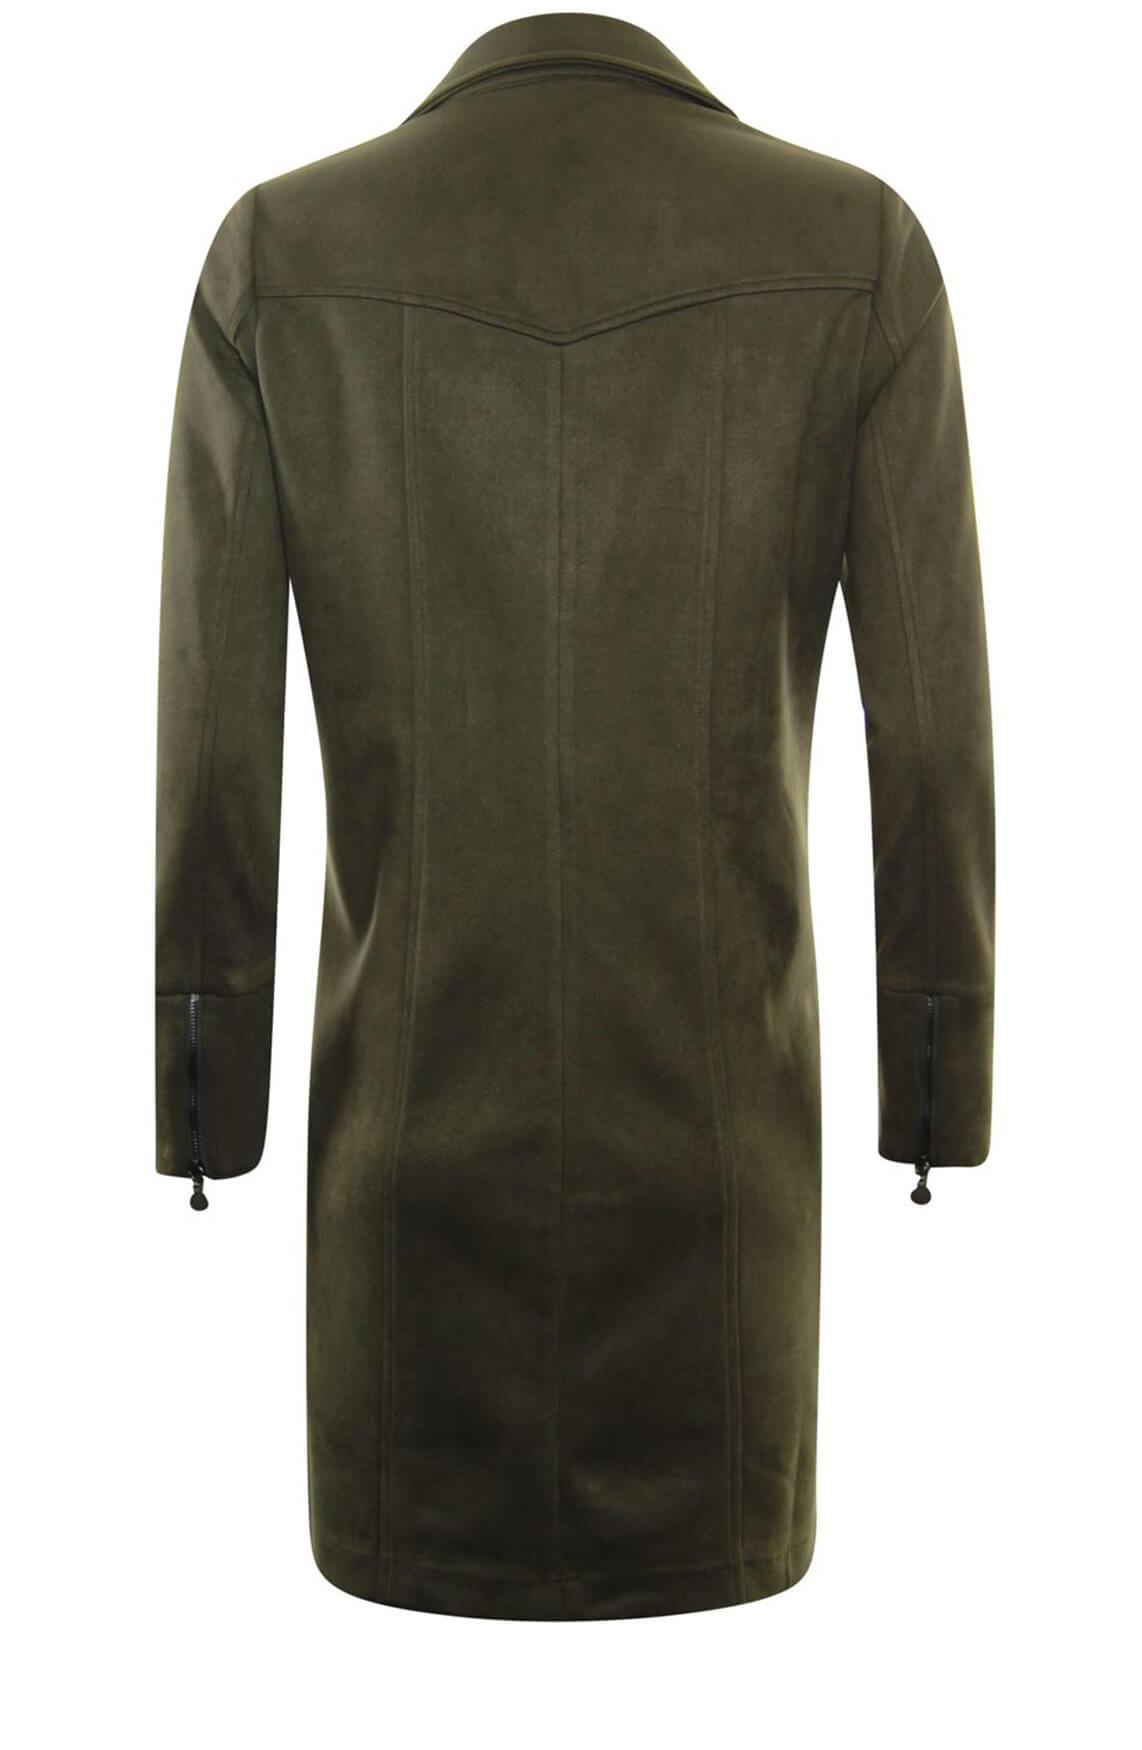 Poools Dames Suède scuba jurk groen